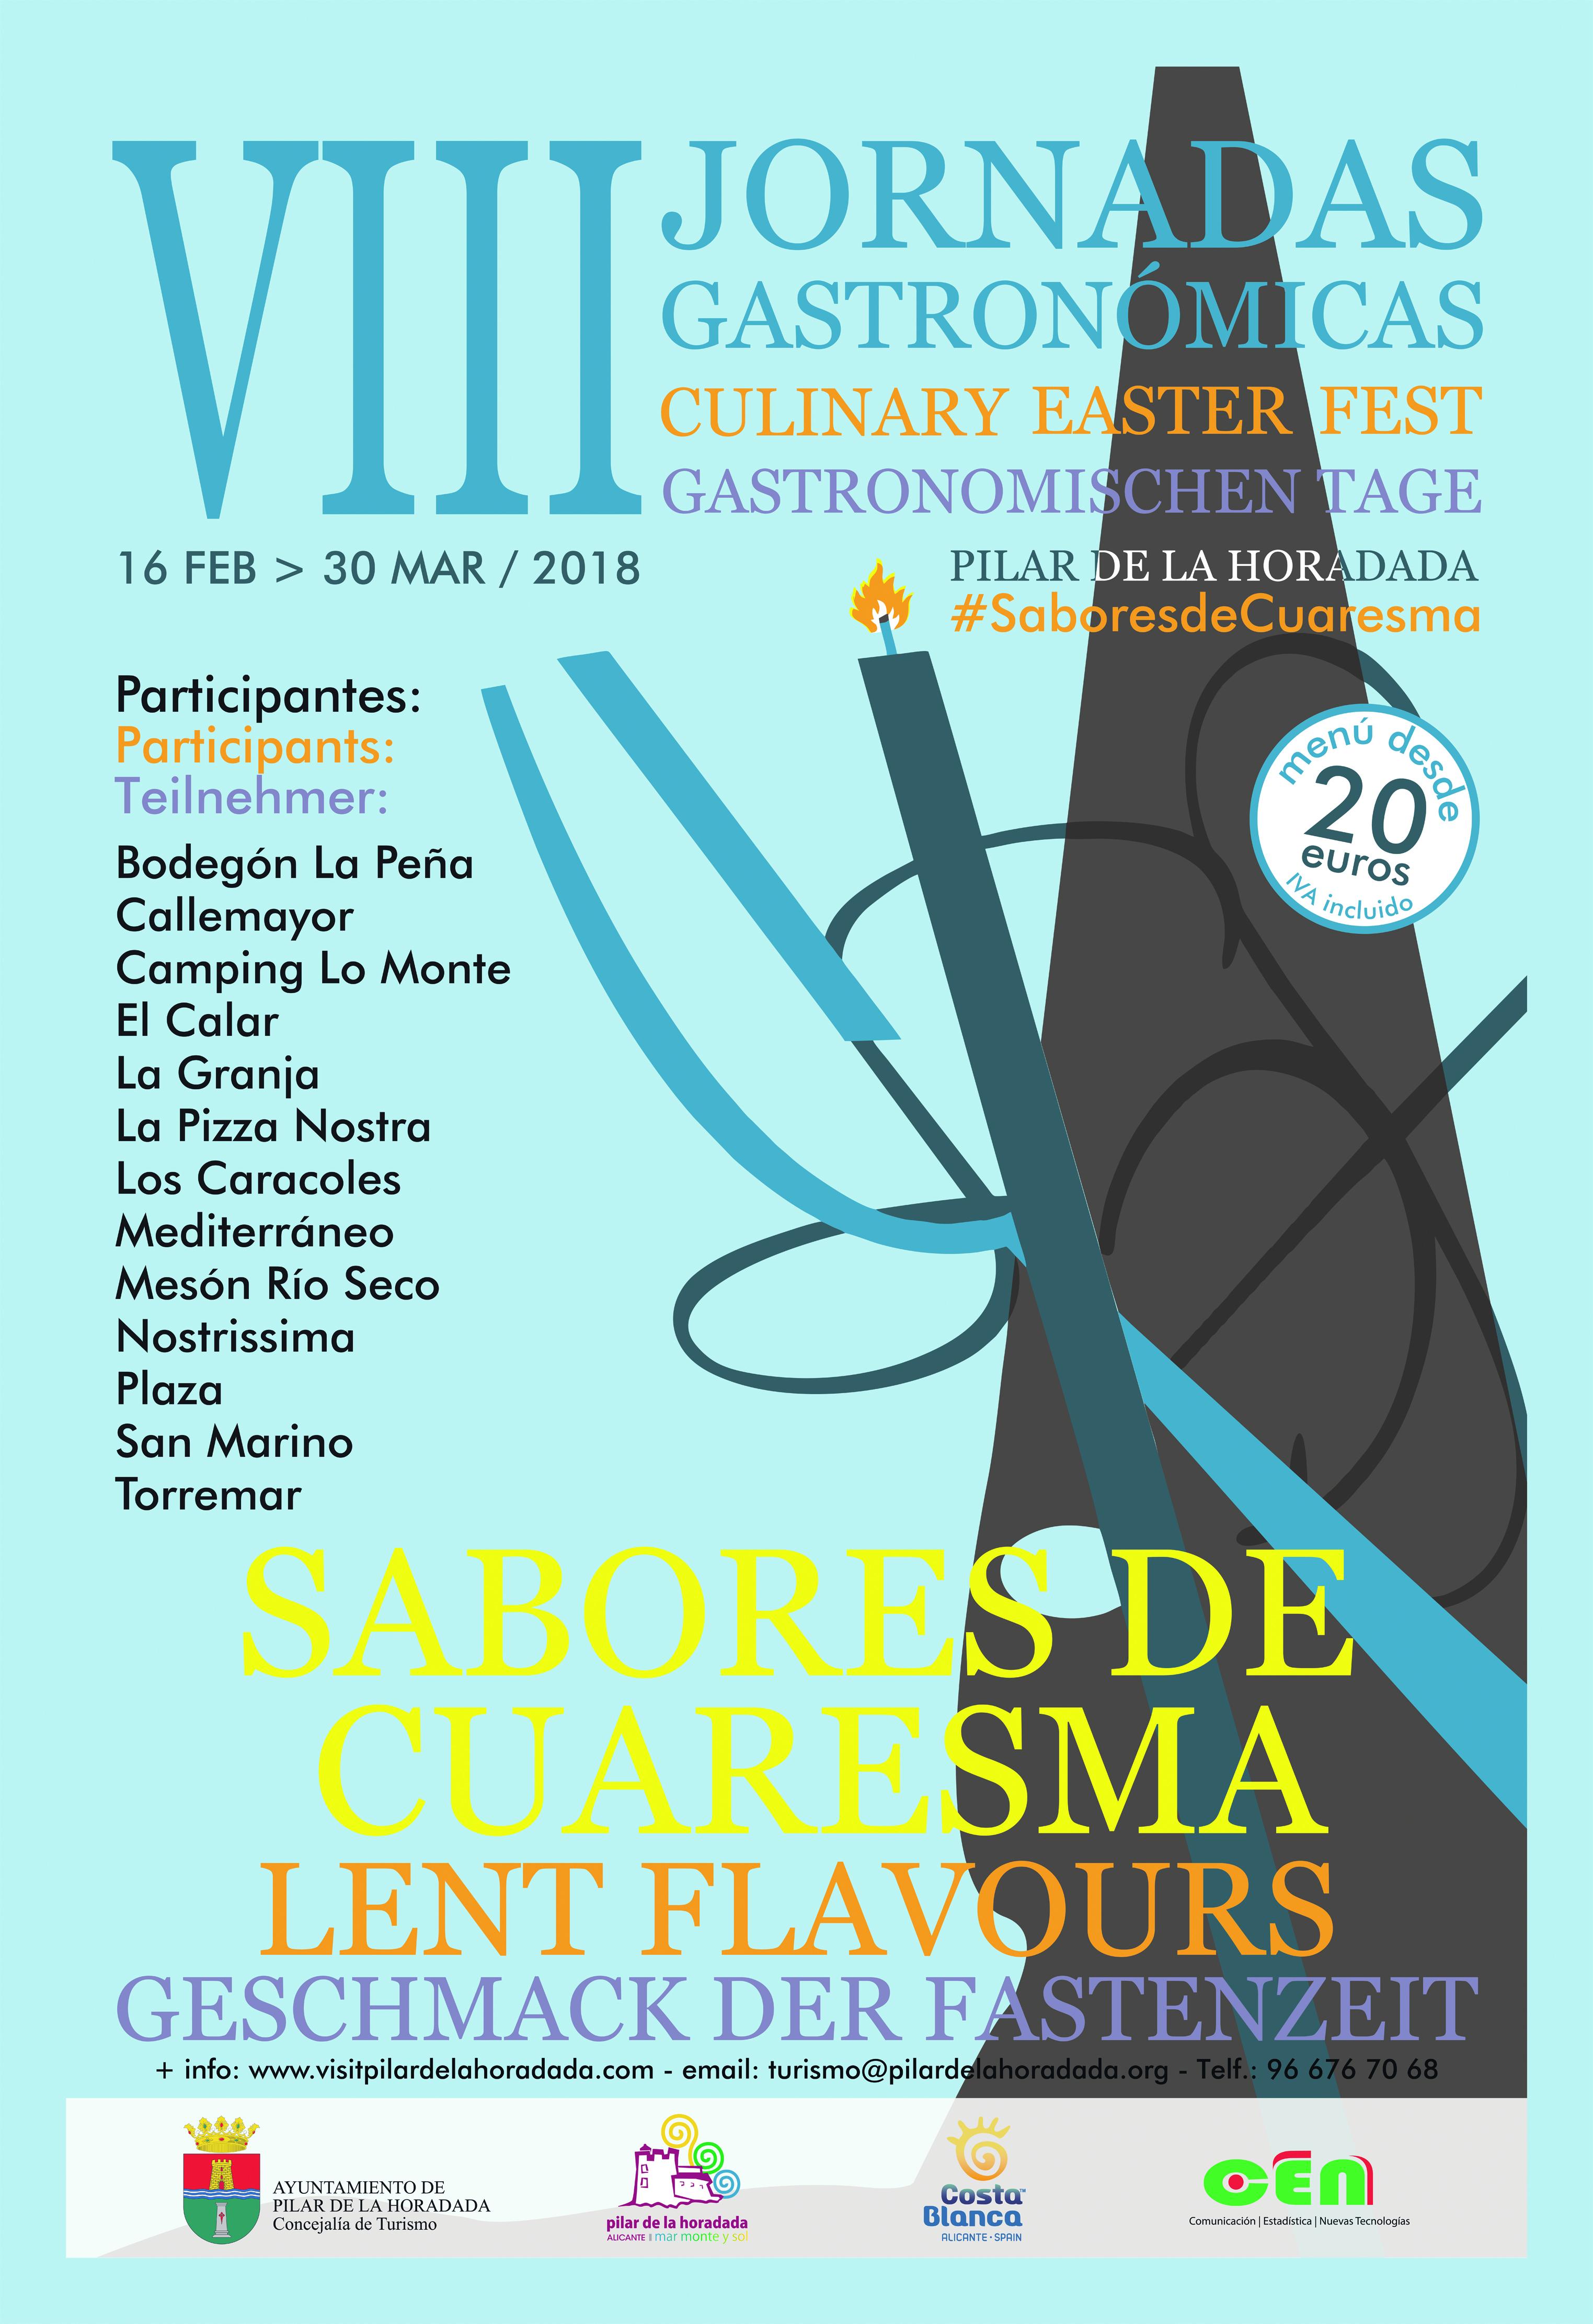 Flavours of Lent in Pilar de la Horadada